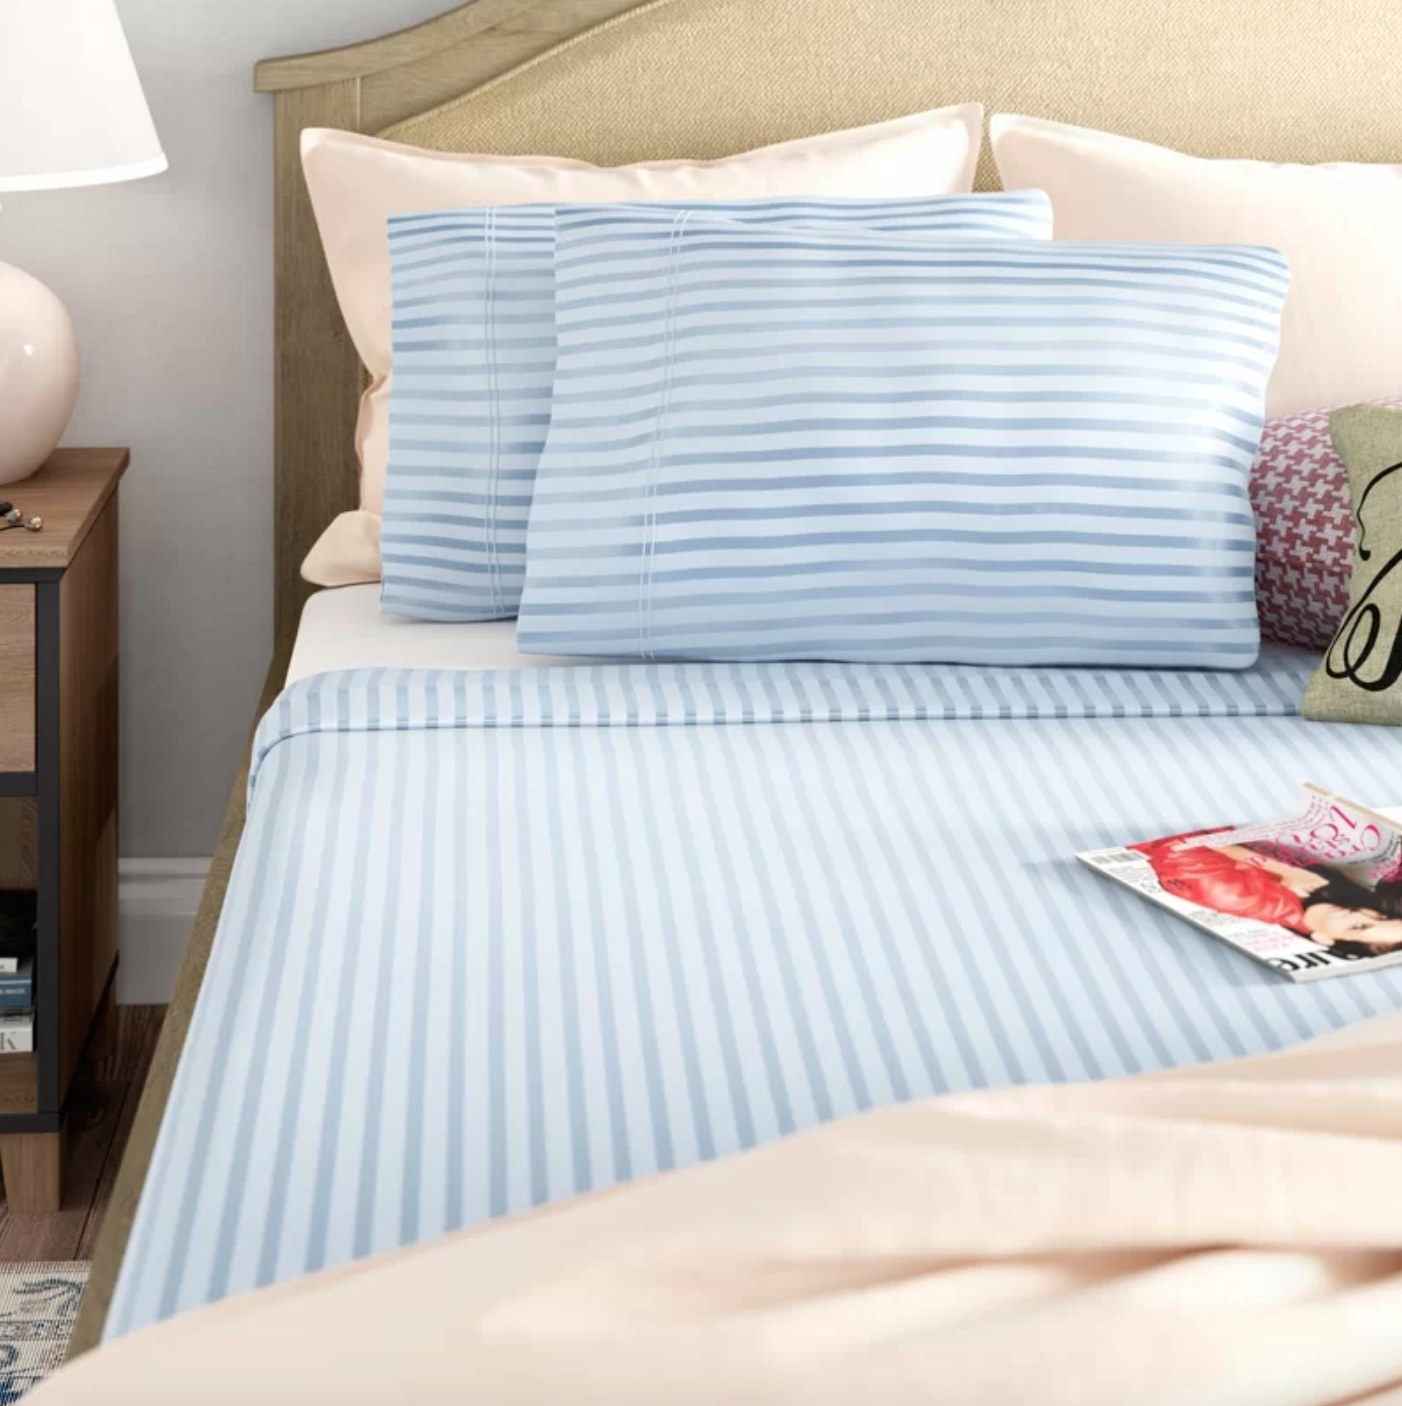 The cotton sheet set in light blue